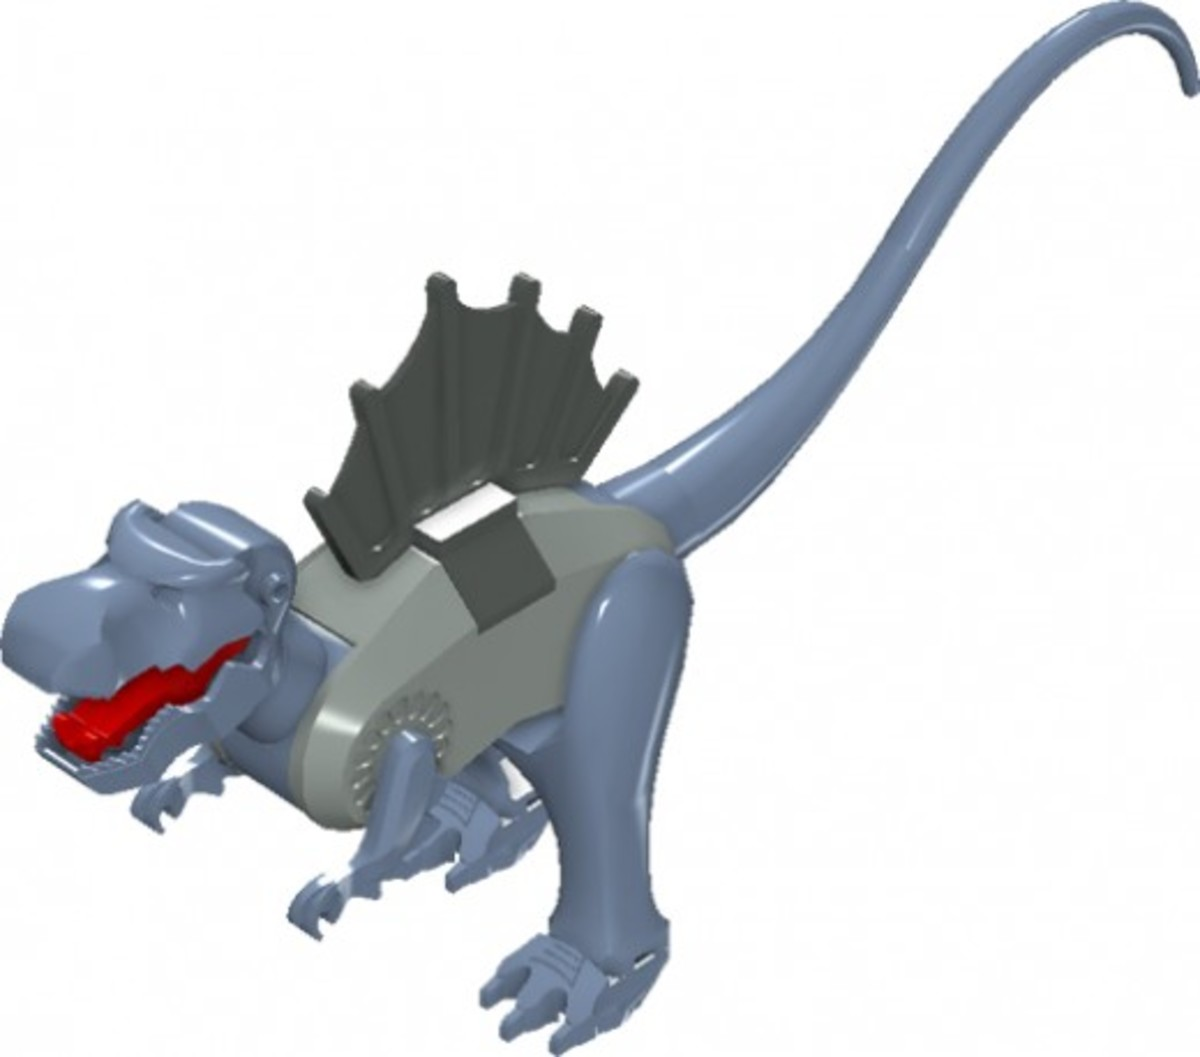 Lego dinosaurs building set list hubpages - Lego dinosaurs spinosaurus ...